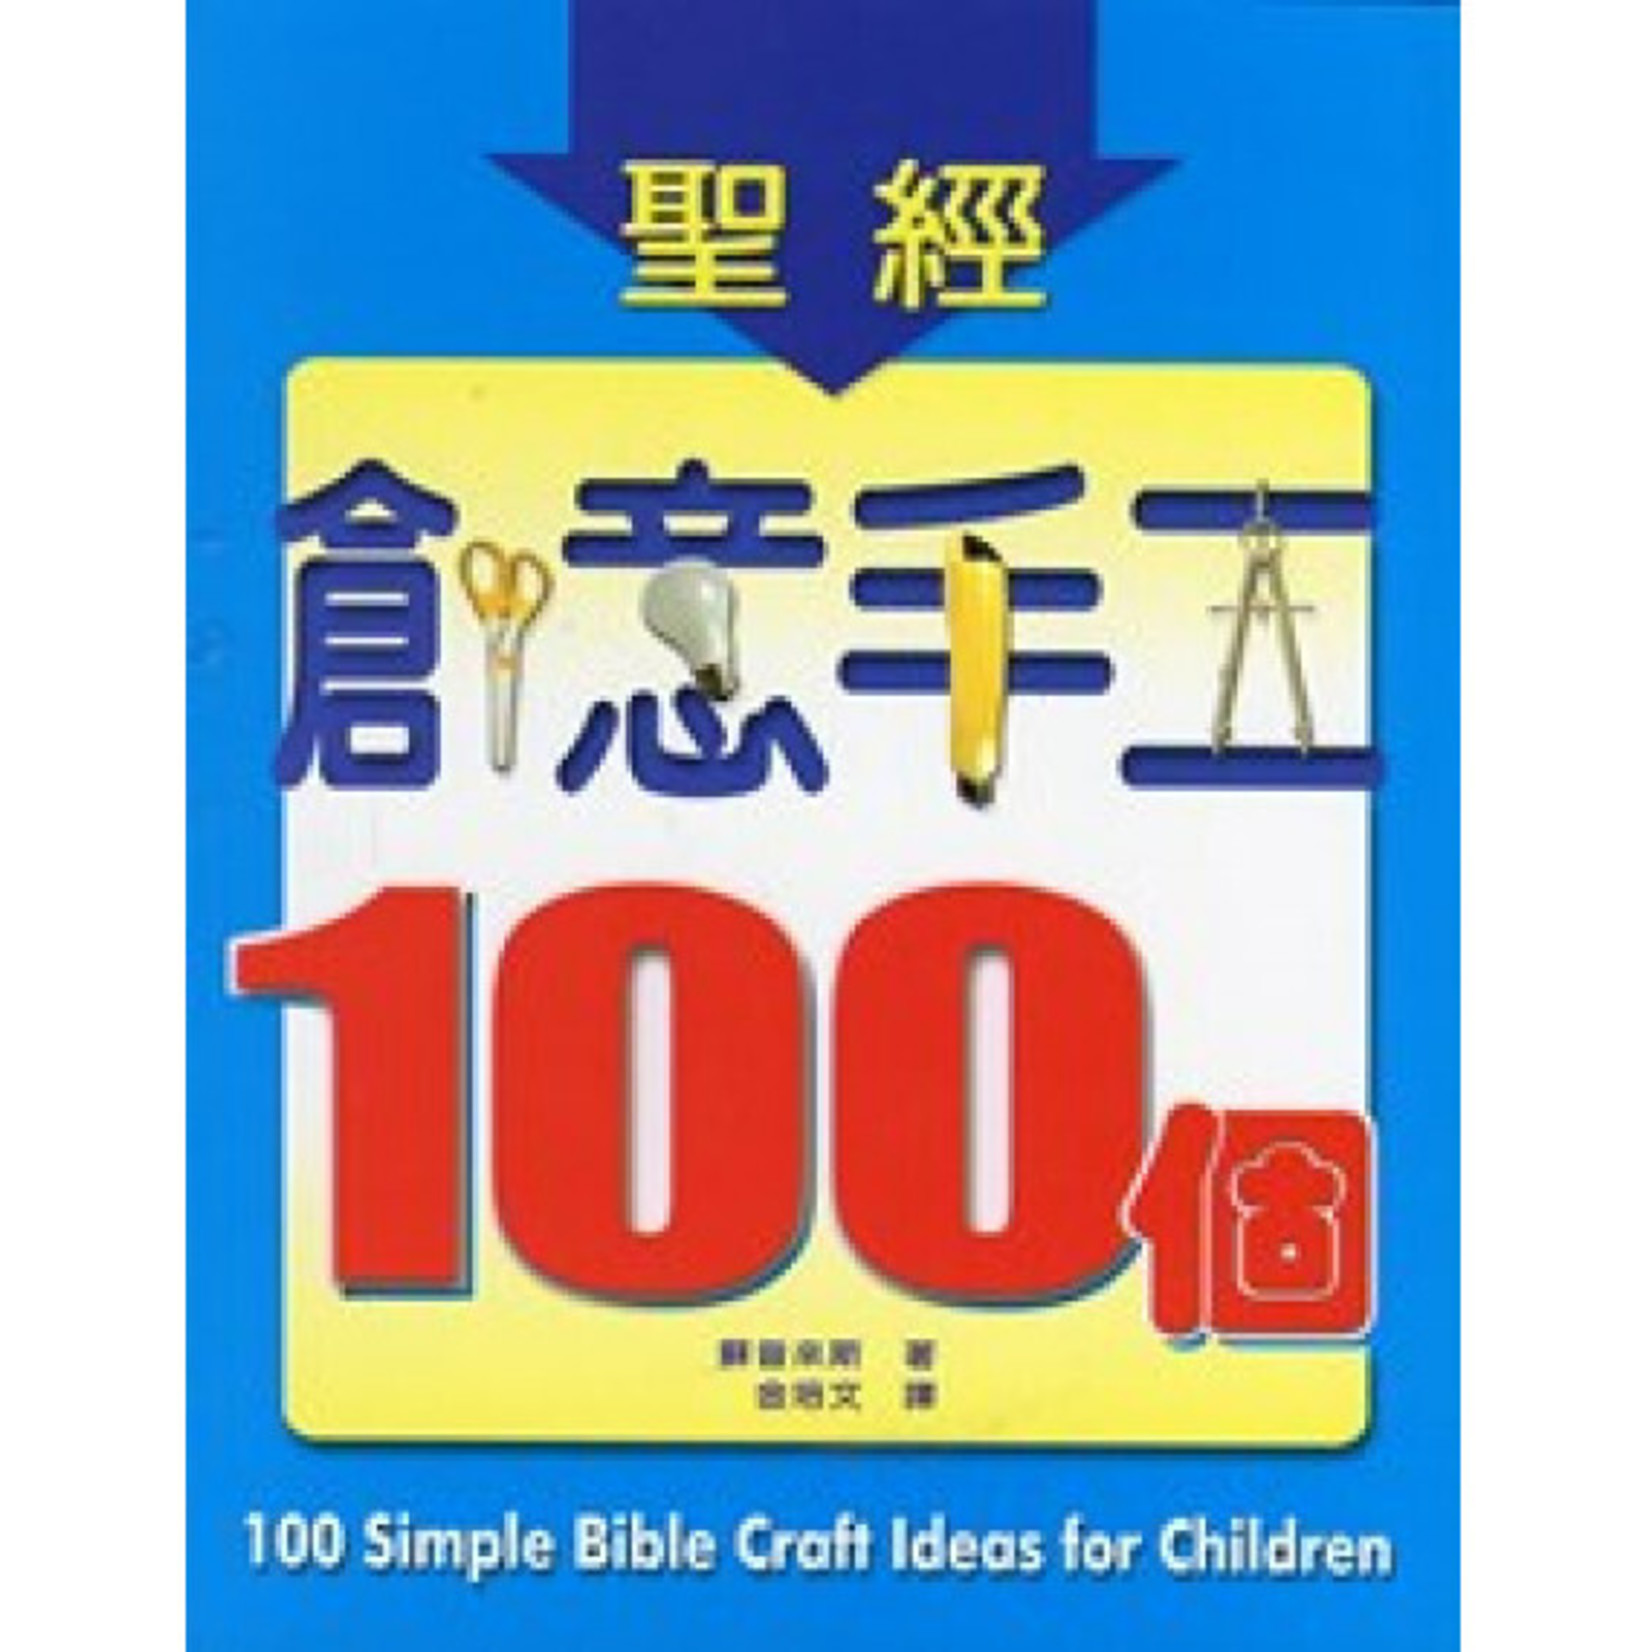 中國主日學協會 China Sunday School Association 聖經創意手工一百個 100 Simple Bible Craft Ideas for Children